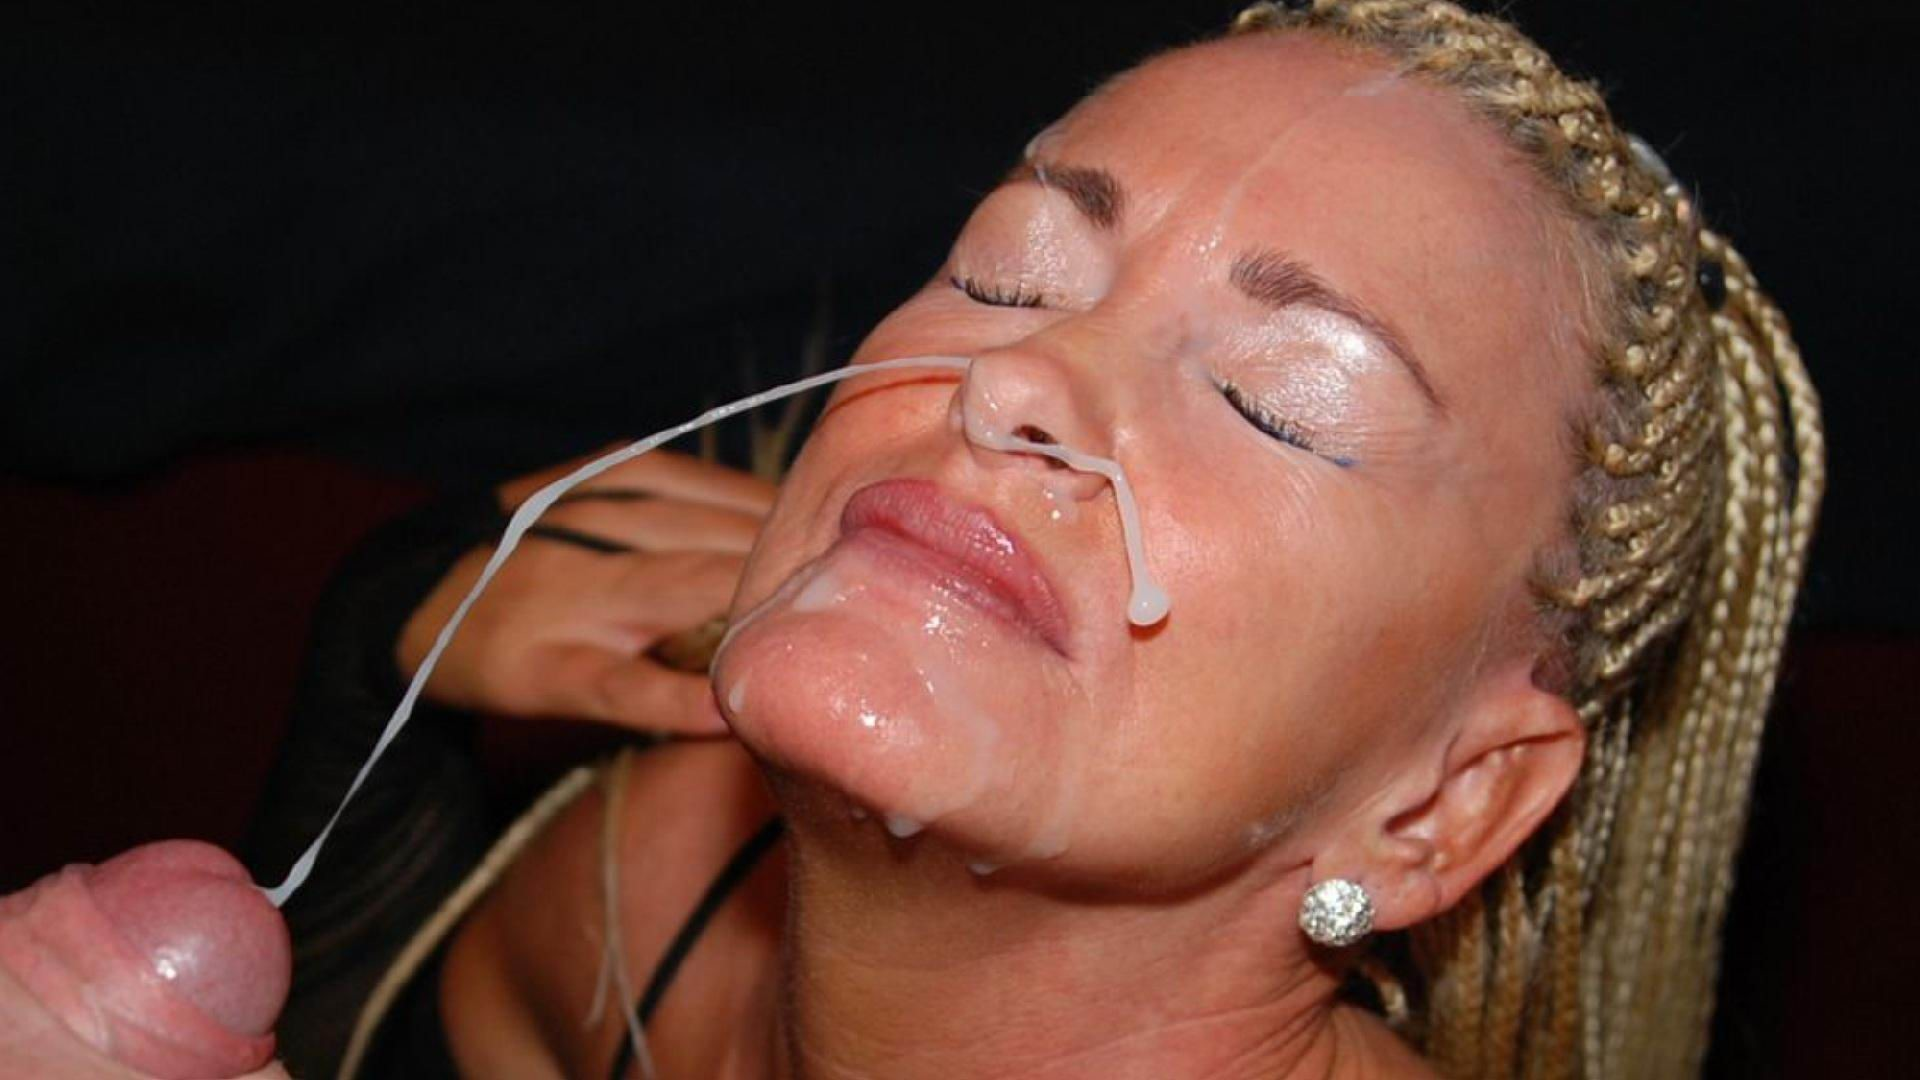 Сперма на лице, камшот подборка